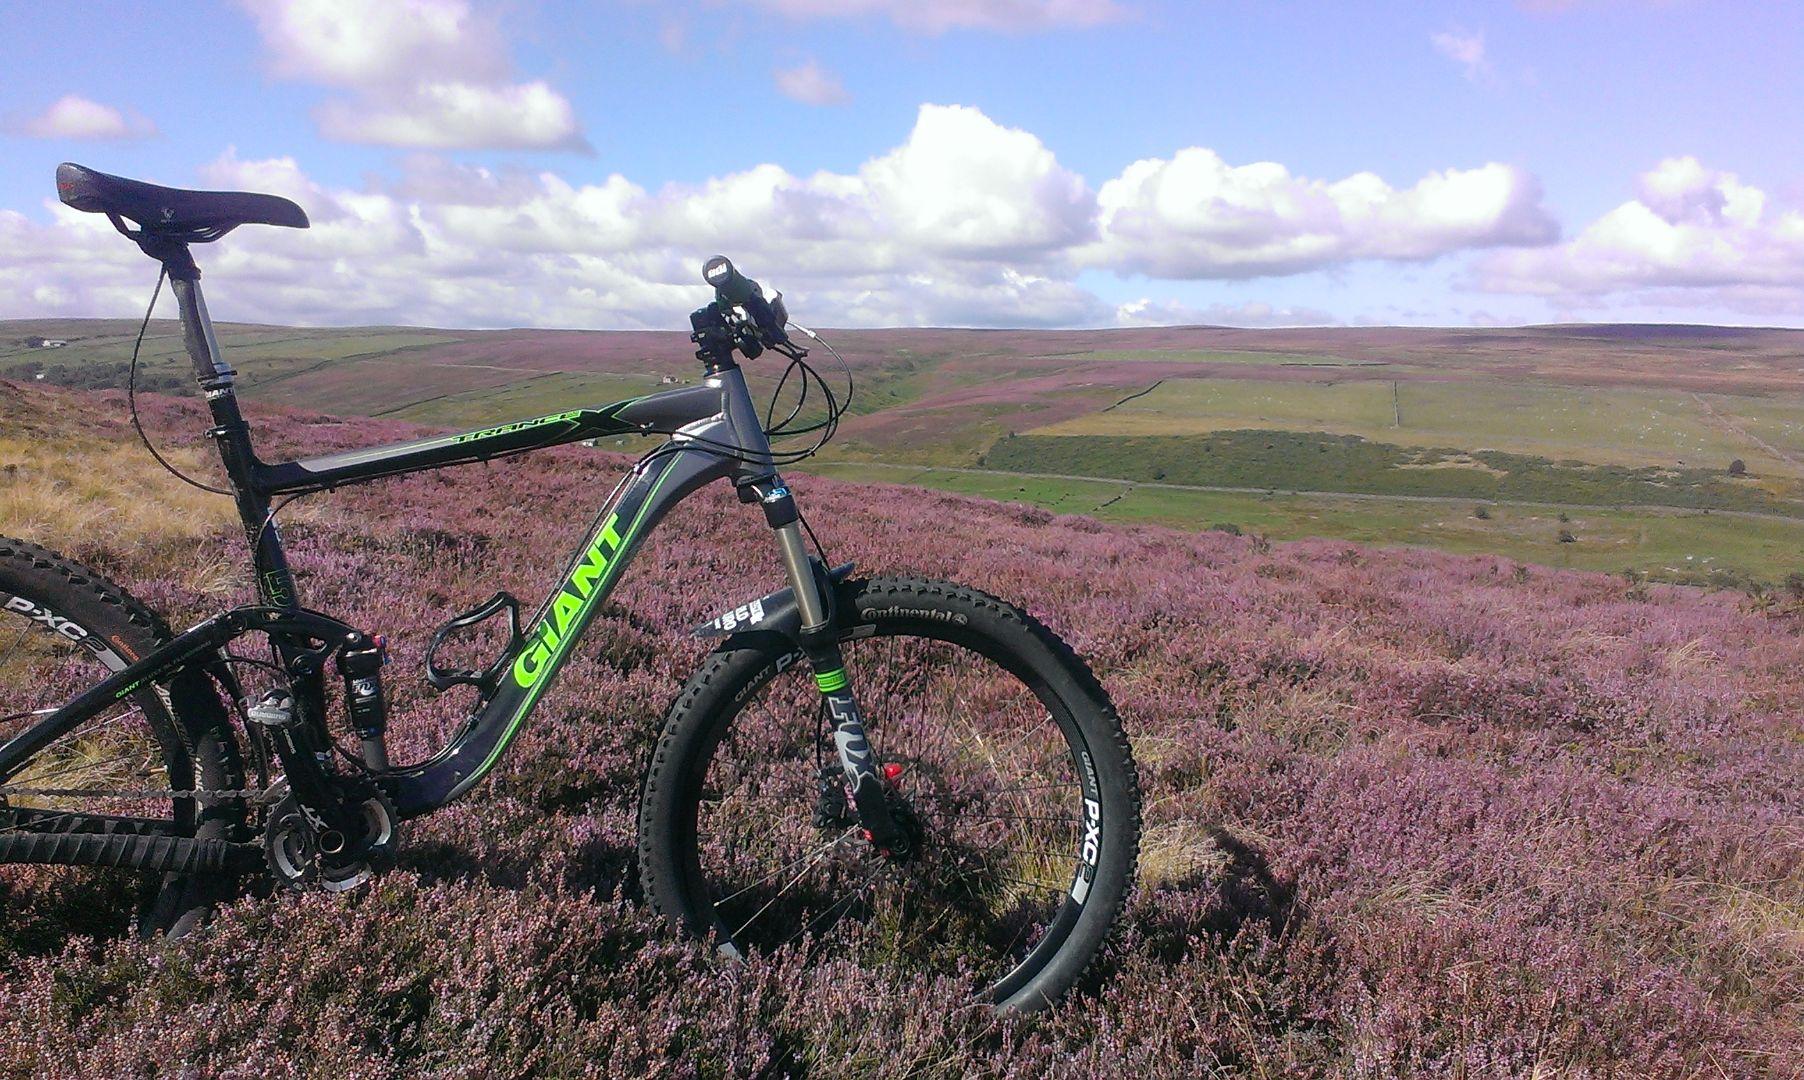 IMAG0396.jpg - UK - Northumberland - Sandstone Way - Self-Guided Mountain Bike Weekend - Mountain Biking